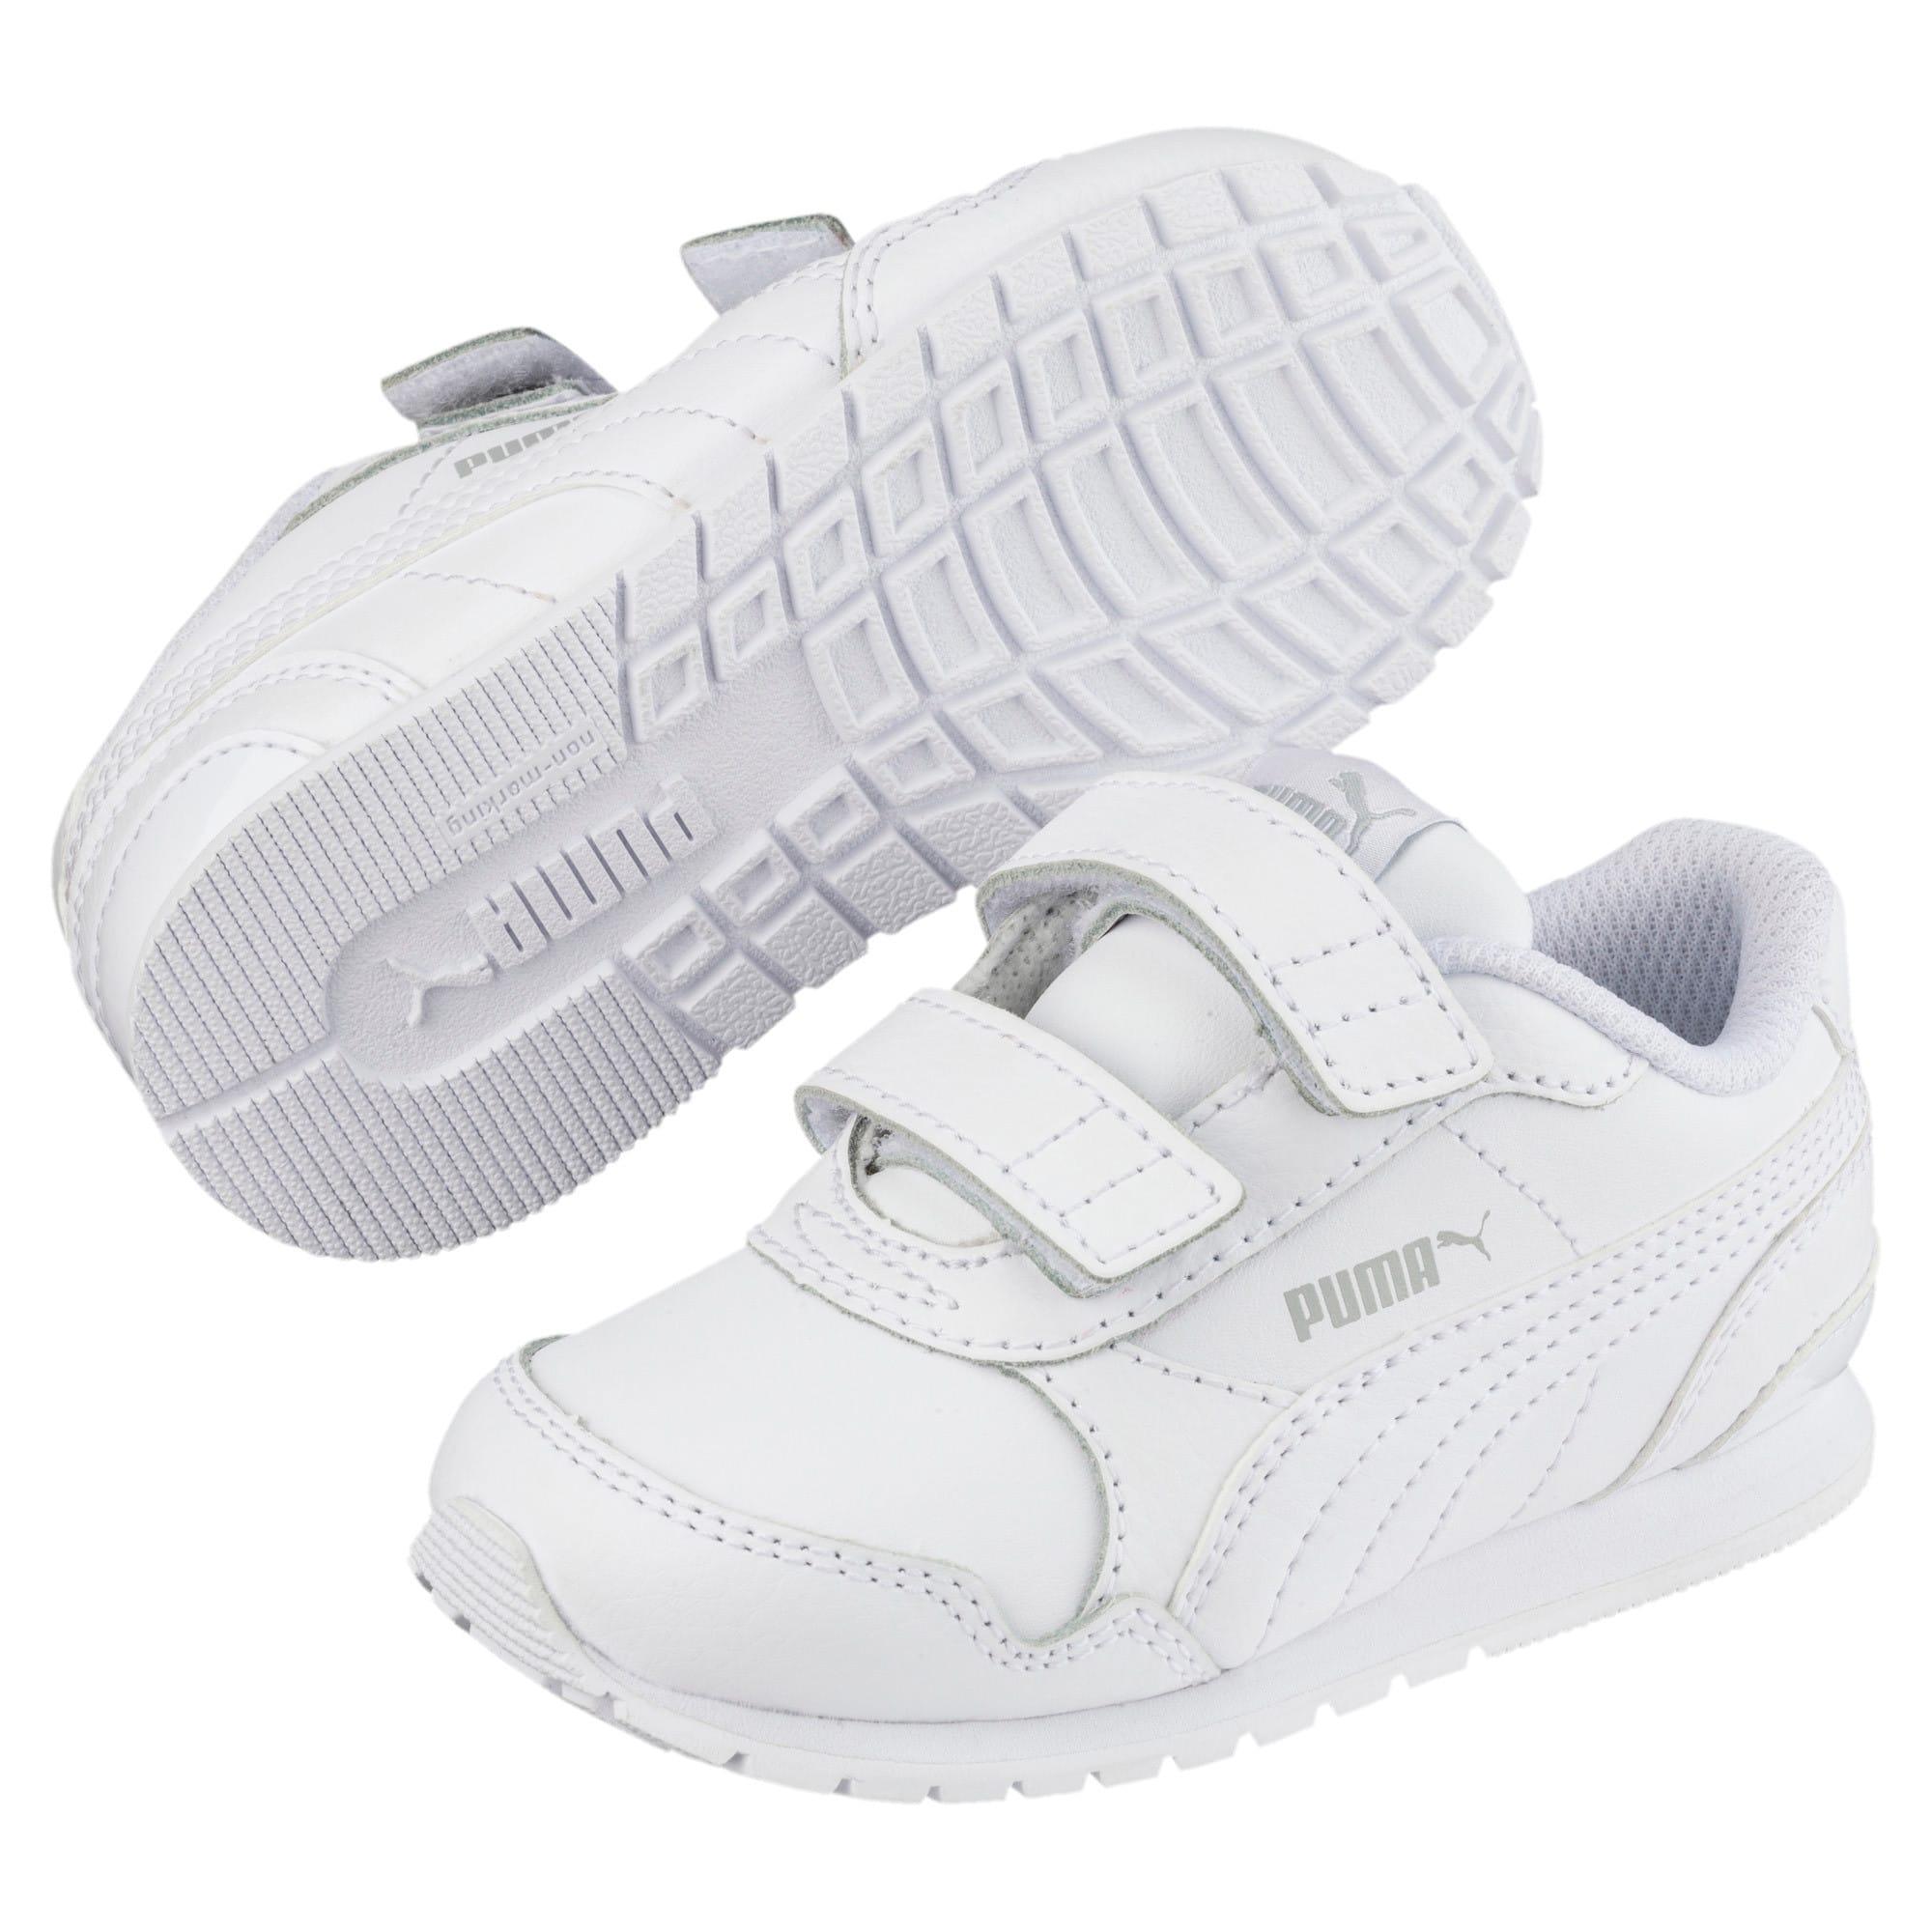 Thumbnail 2 of ST Runner v2 AC Shoes INF, Puma White-Gray Violet, medium